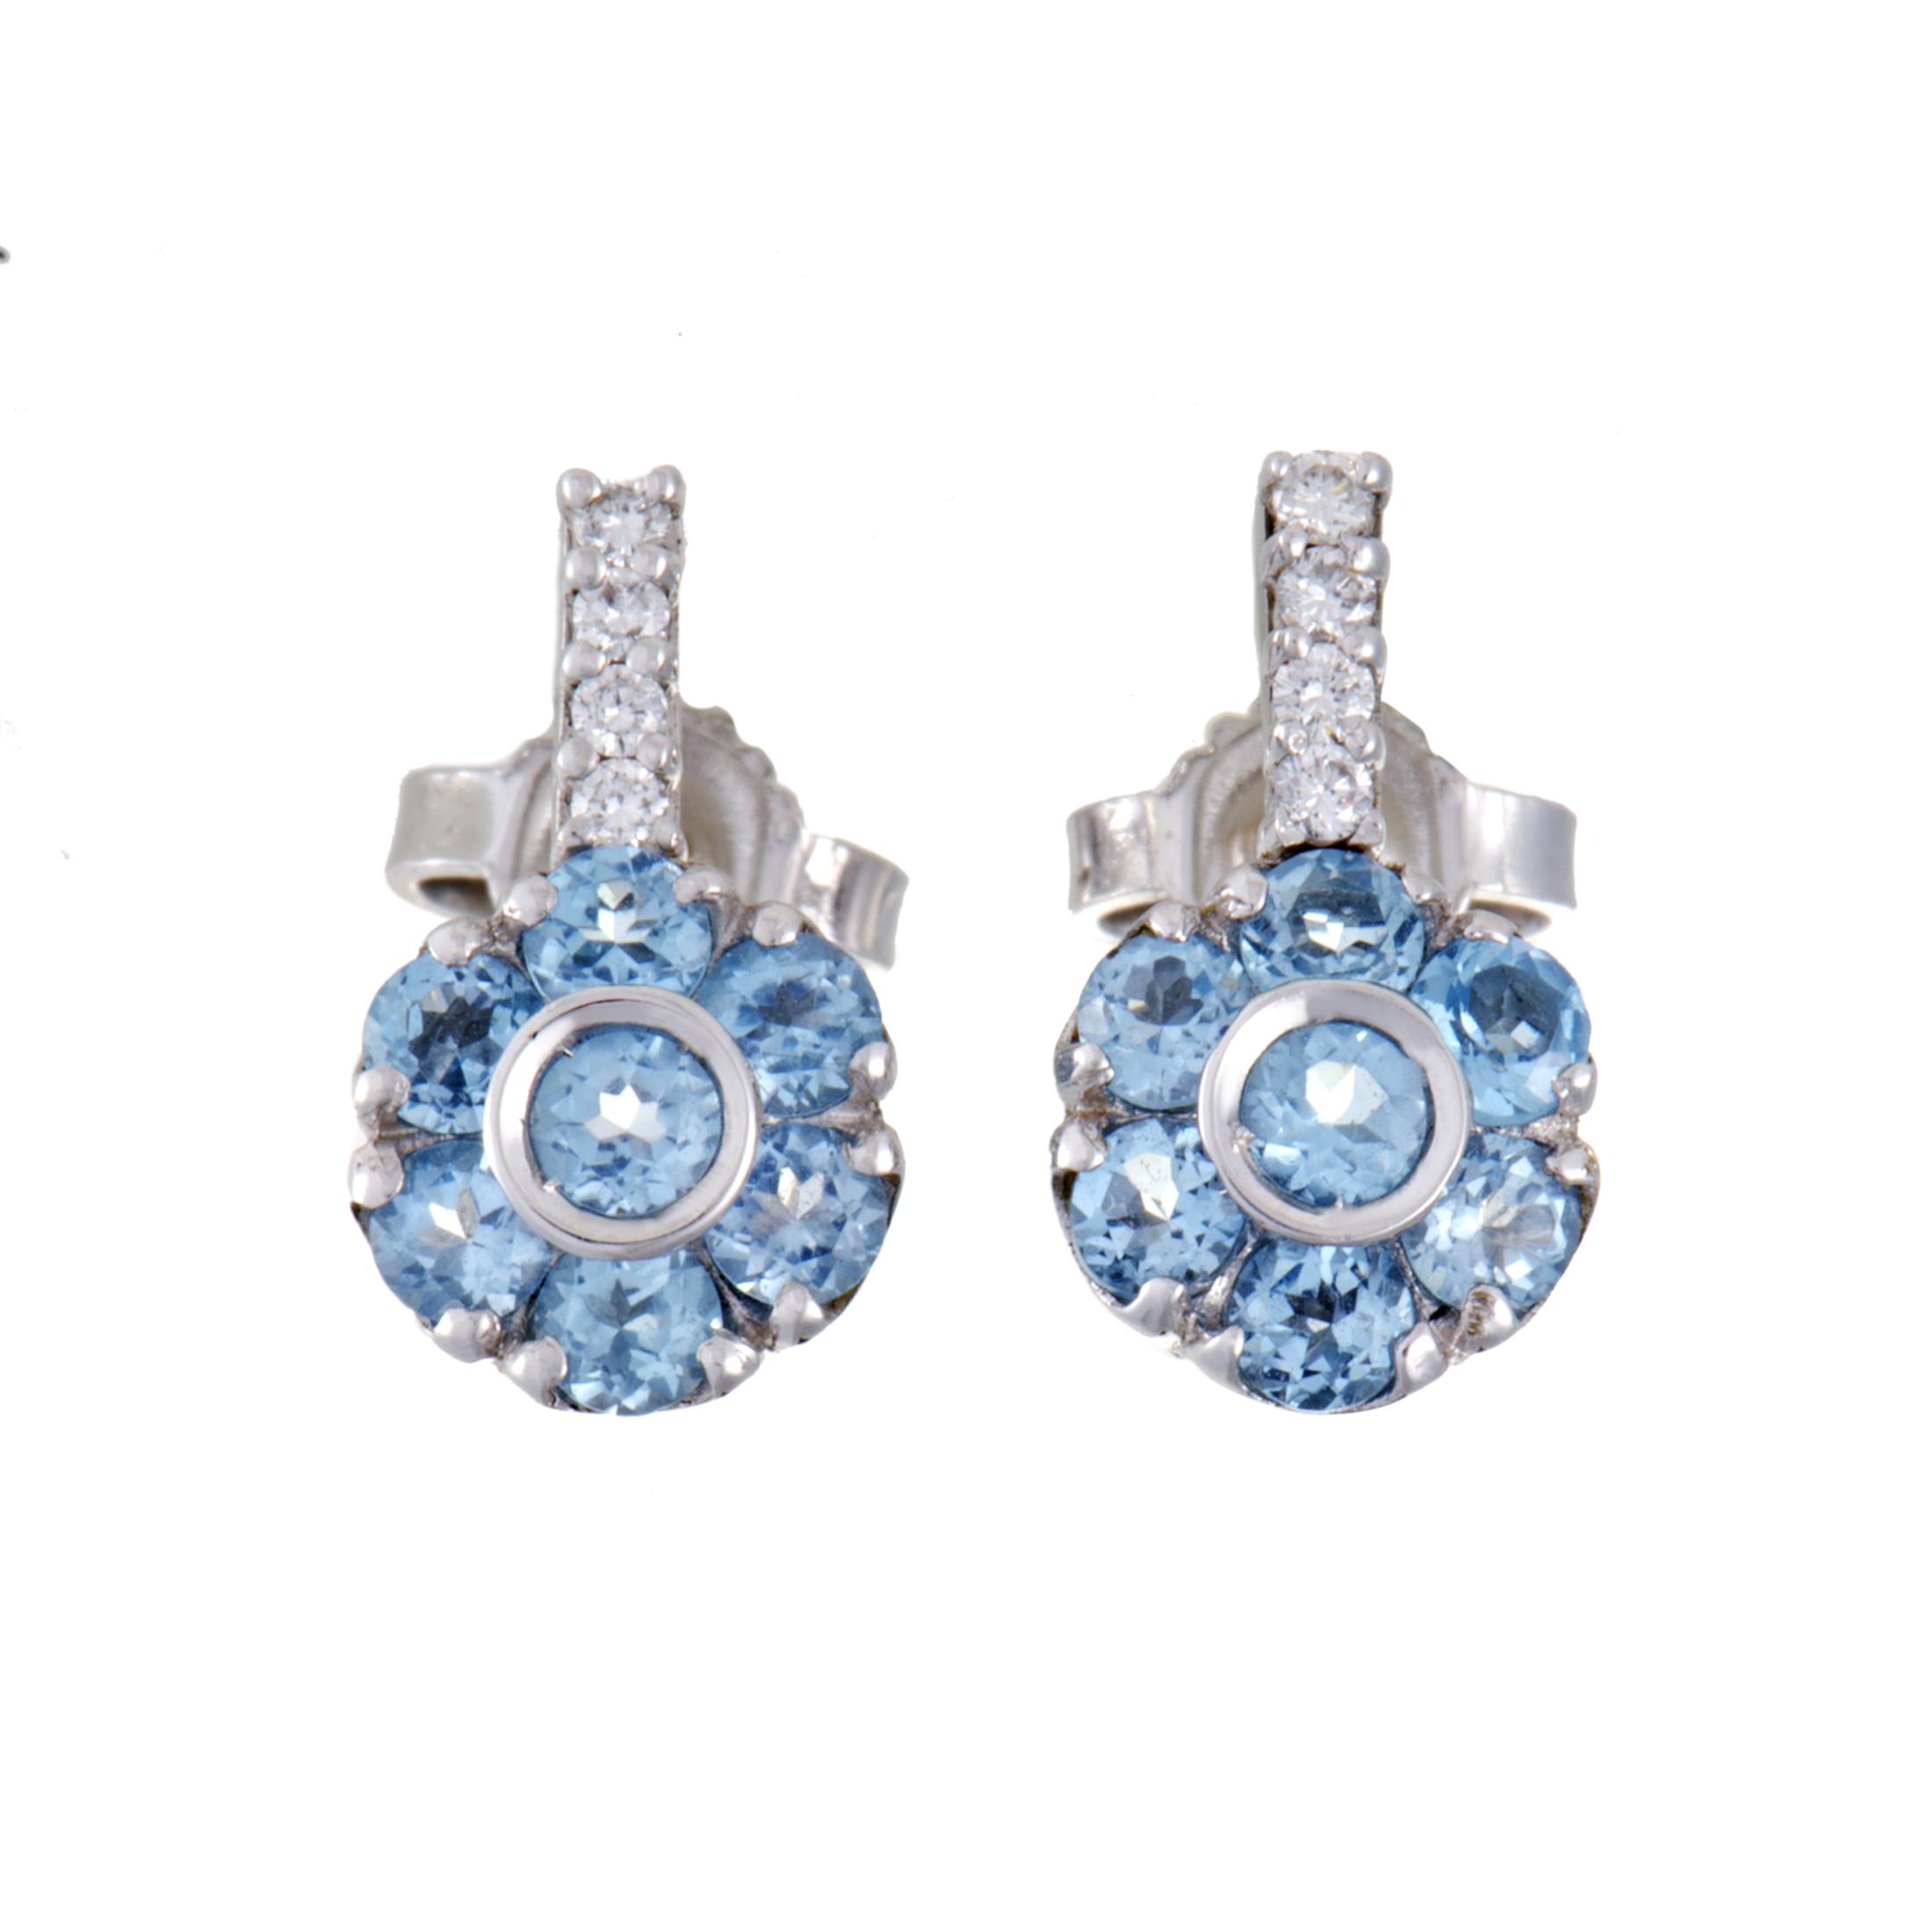 """""Pasquale Bruni Fiori 18K White Gold Diamond and Topaz Flower Earrings"""""" 1353337"